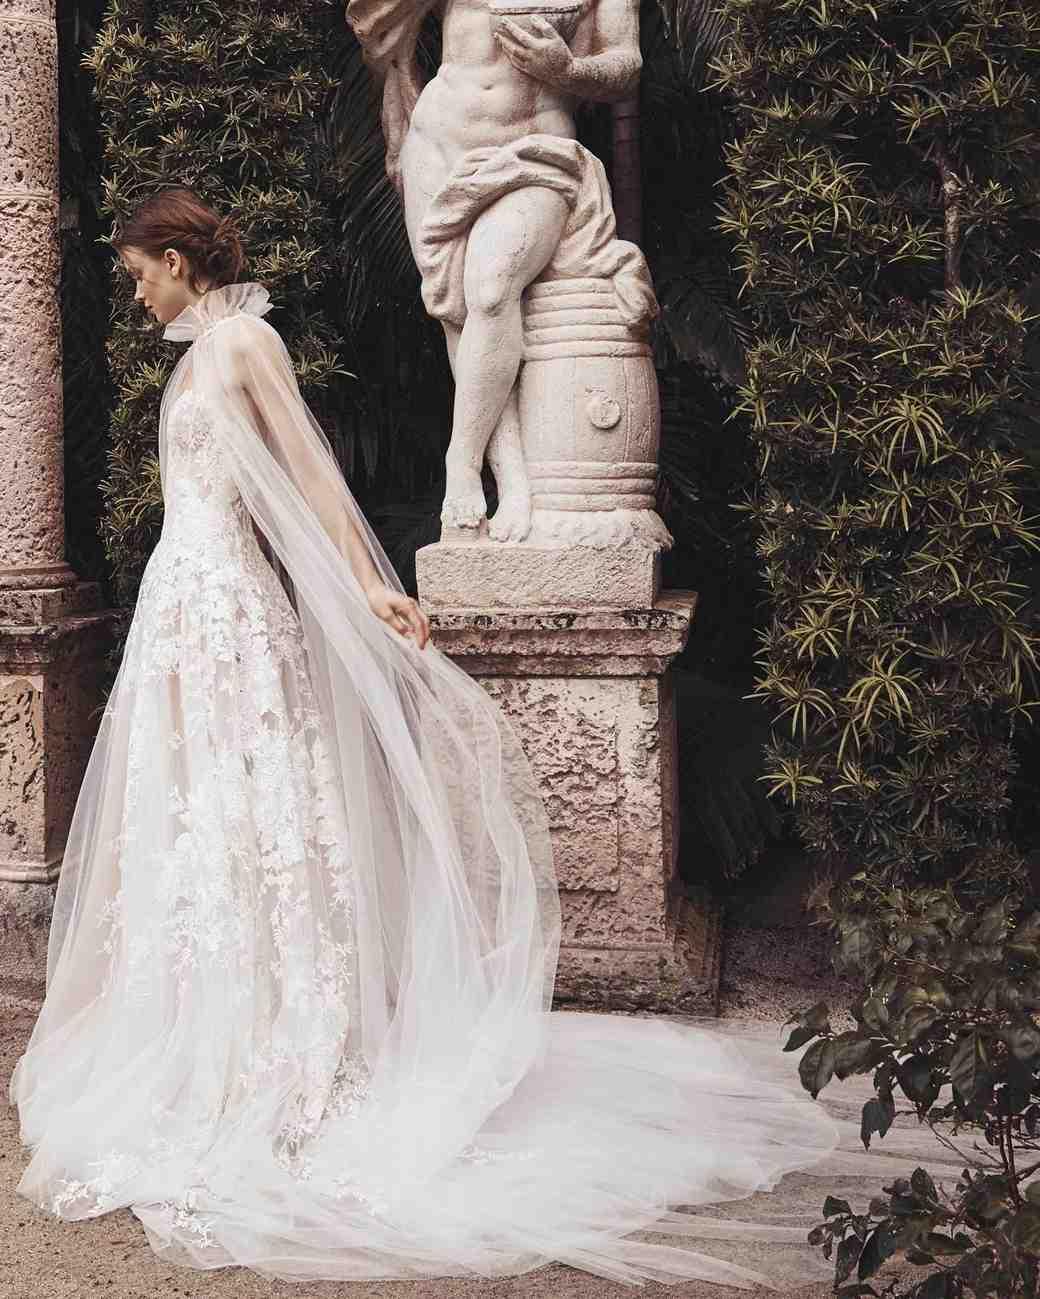 6421189a437d Monique Lhuillier Spring 2020 Wedding Dress Collection | Martha Stewart  Weddings